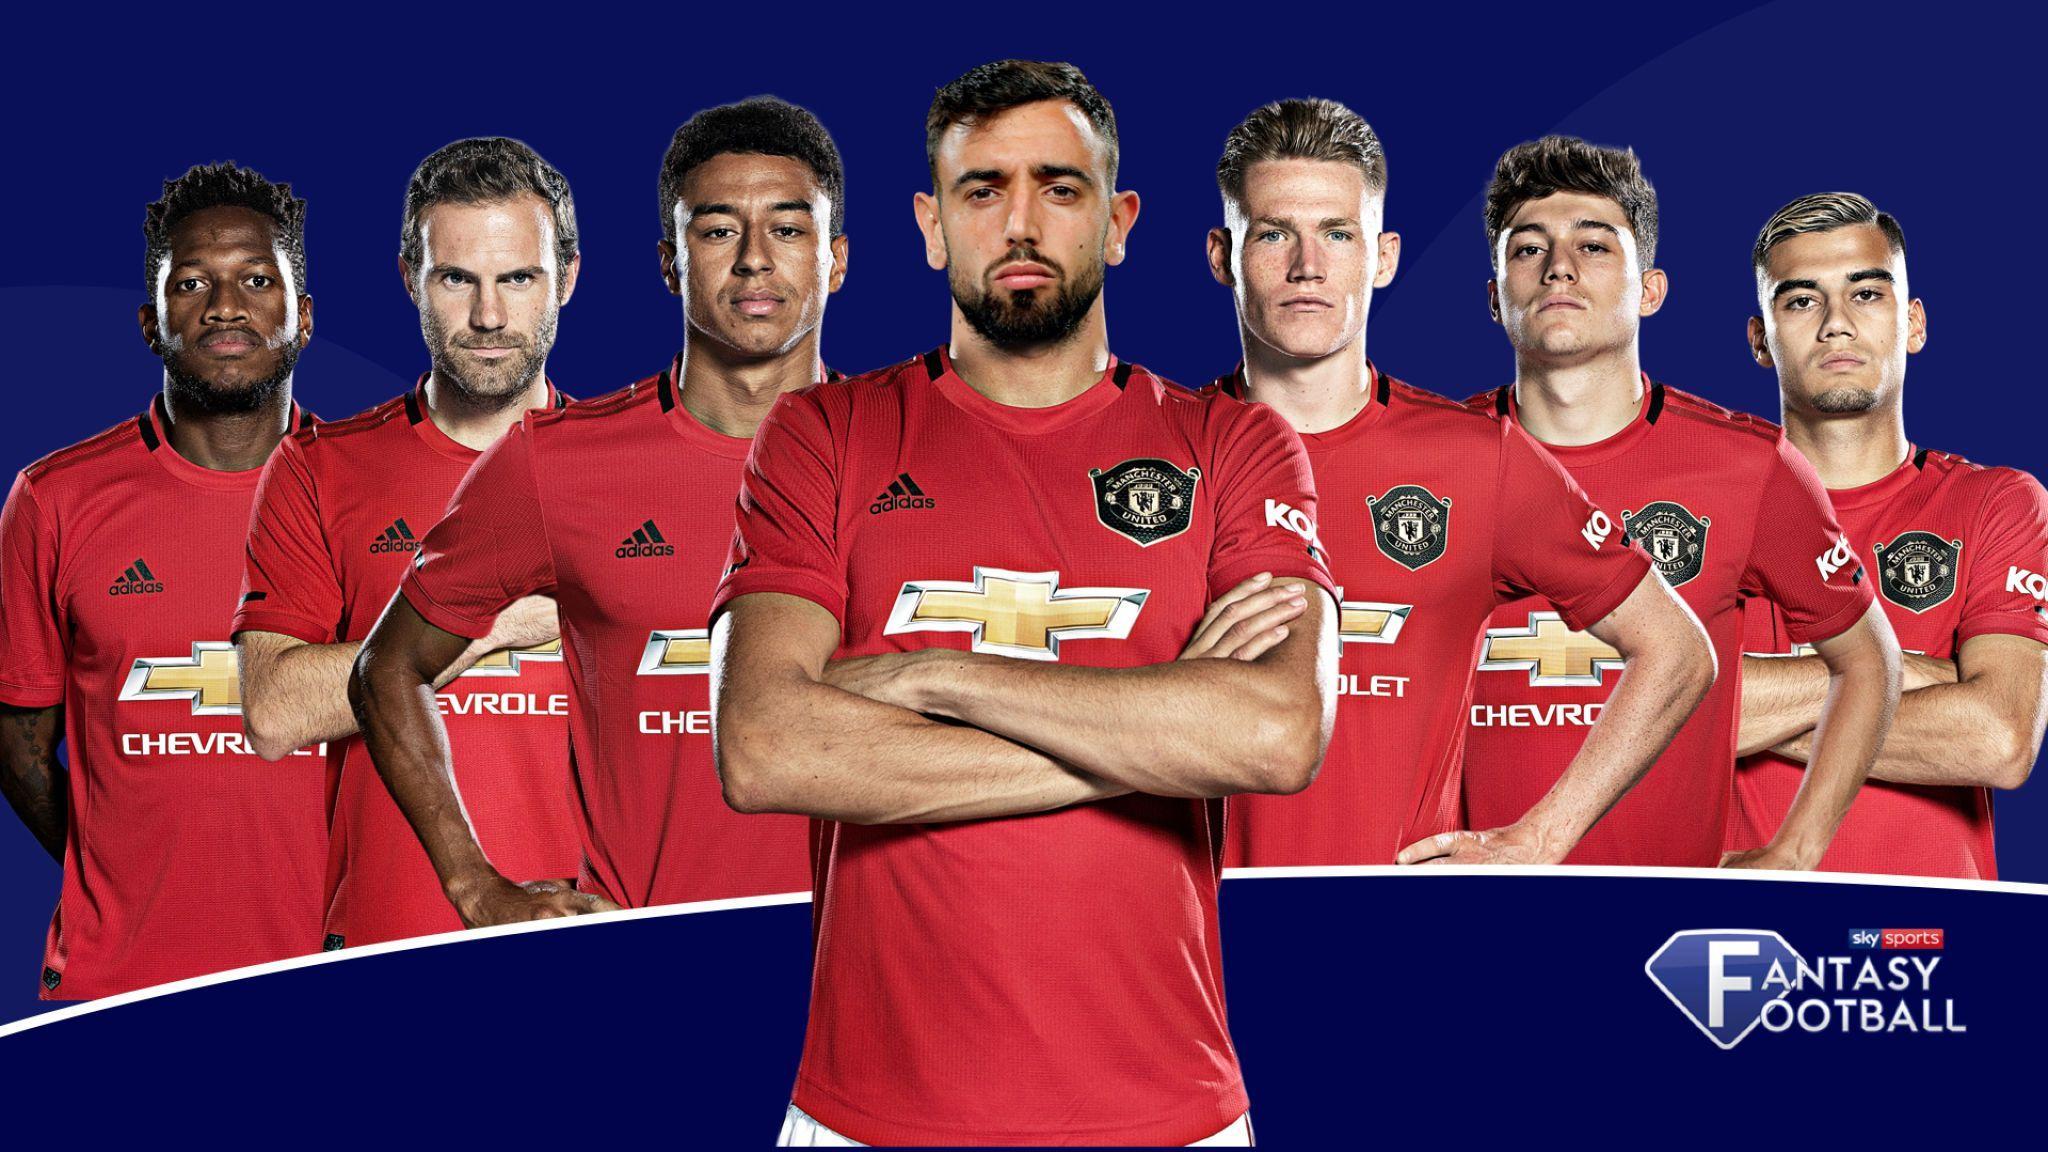 Bruno Fernandes Manchester United Wallpapers